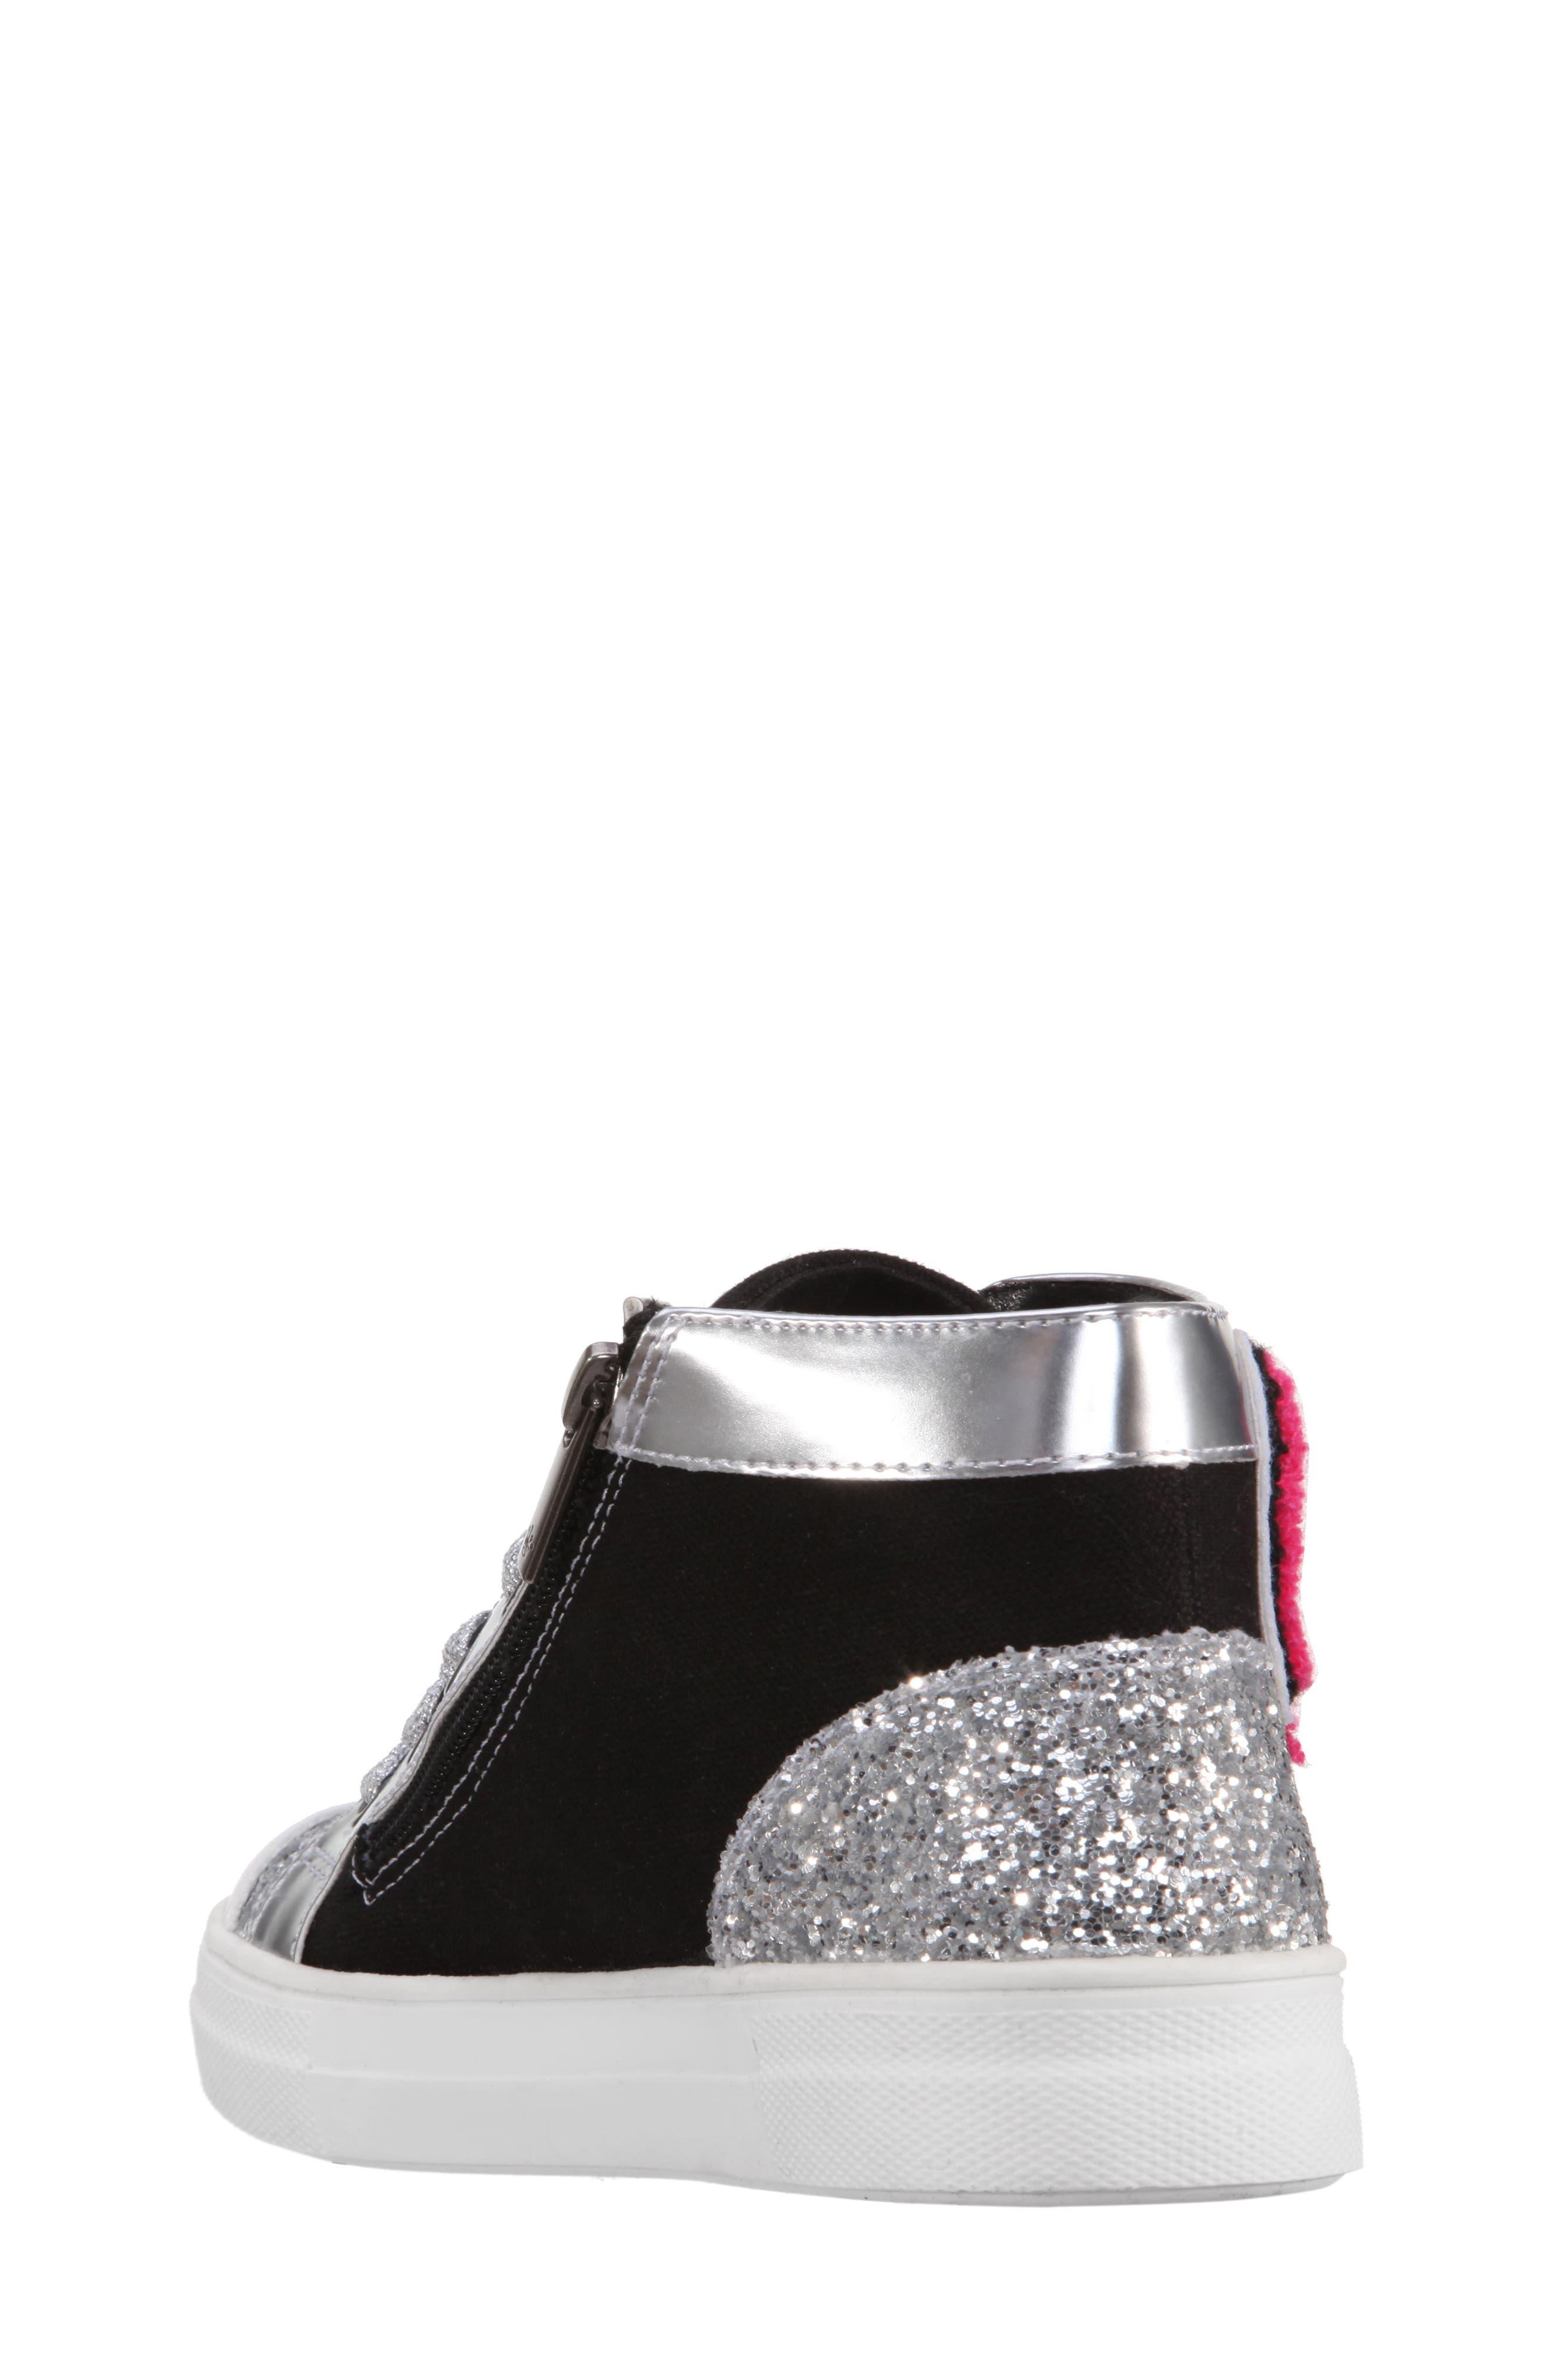 Gita High Top Sneaker,                             Alternate thumbnail 2, color,                             009